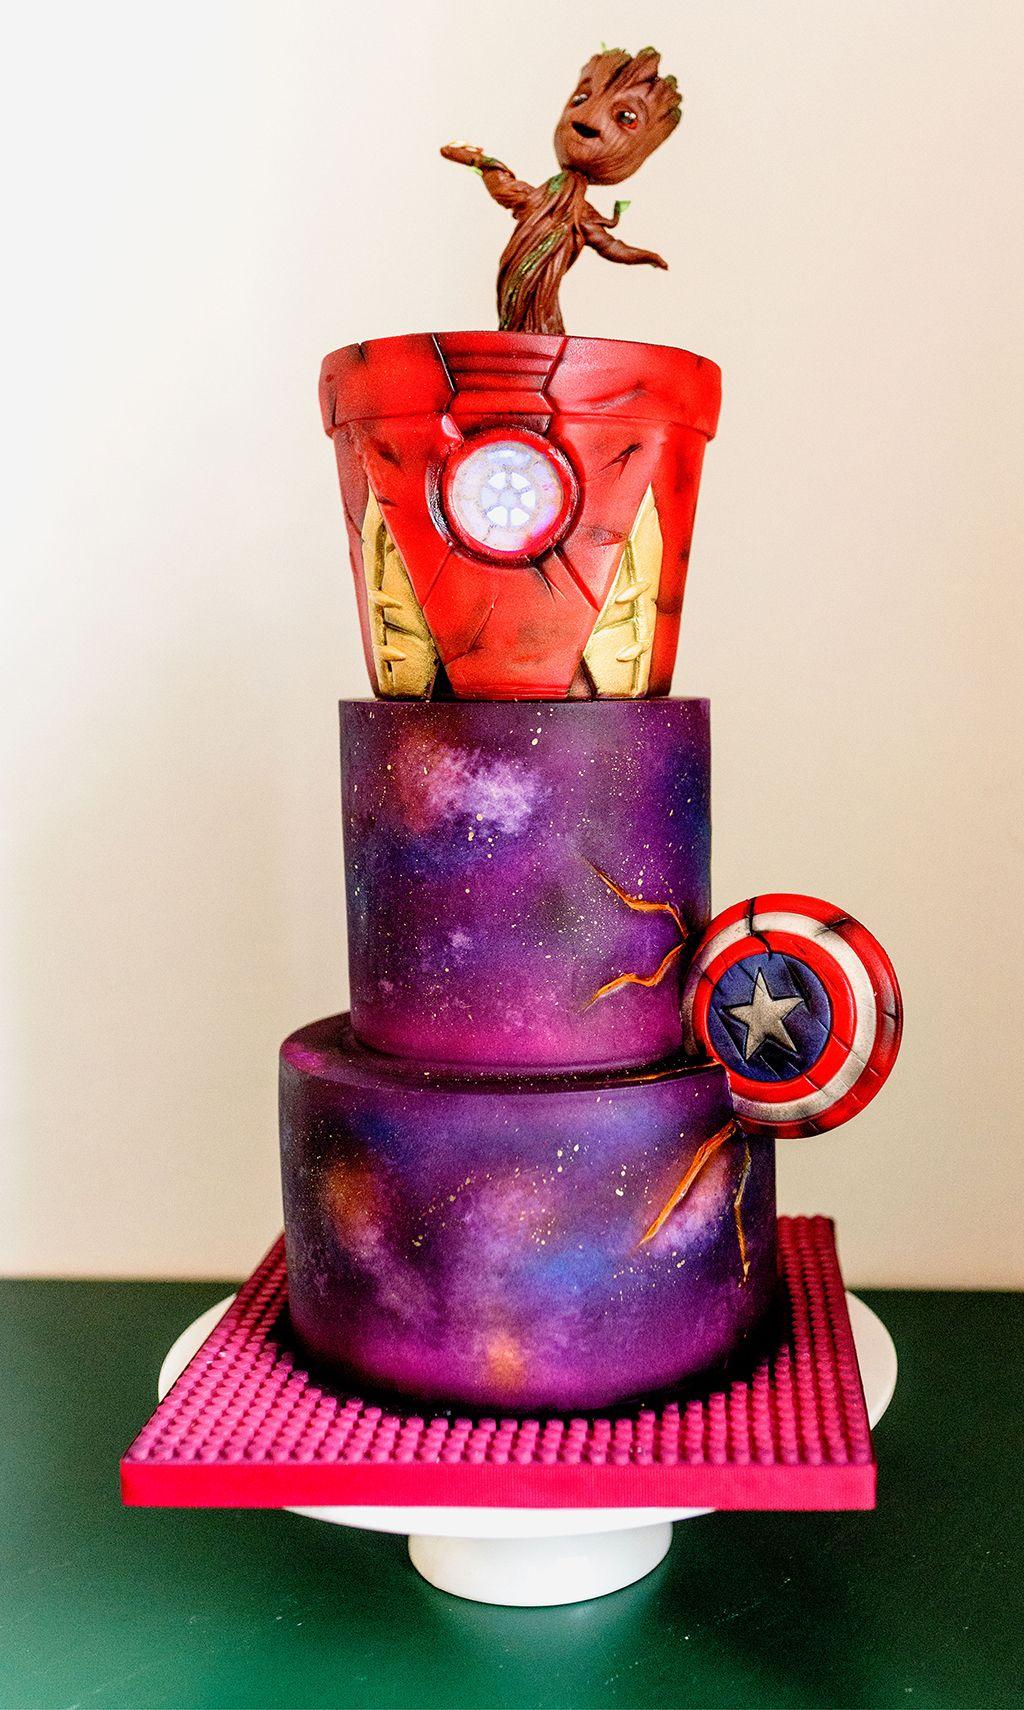 Pin By Karen R On Let Them Eat Cake In 2019 Marvel